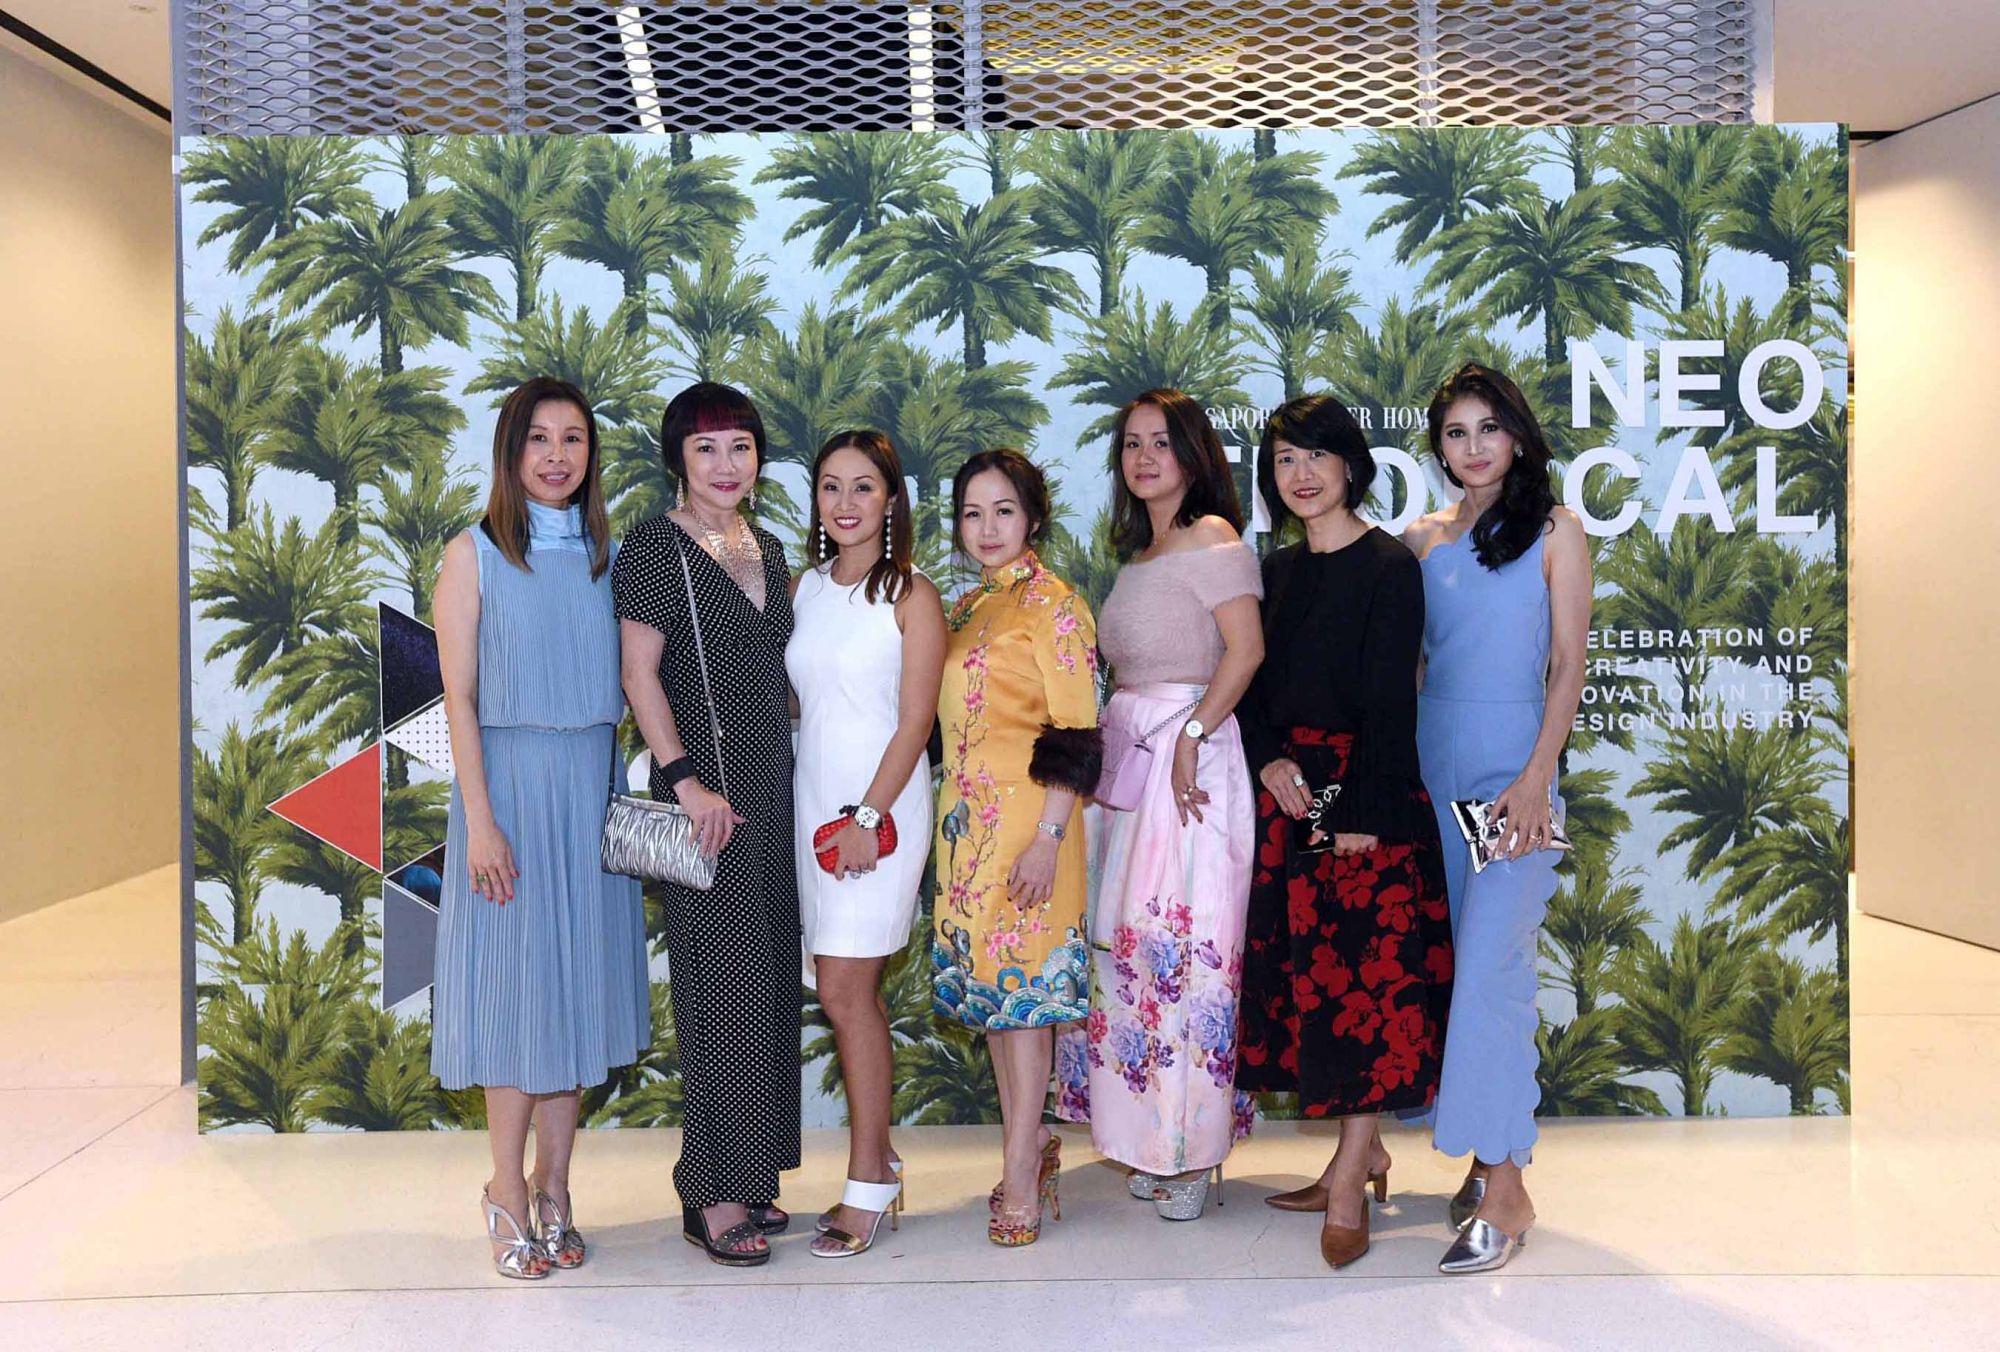 Stephanie Tay, Frances Low, Serene Chua, Tonya Tan, Nancy Low, Nancy Ong, Karen Ong-Tan